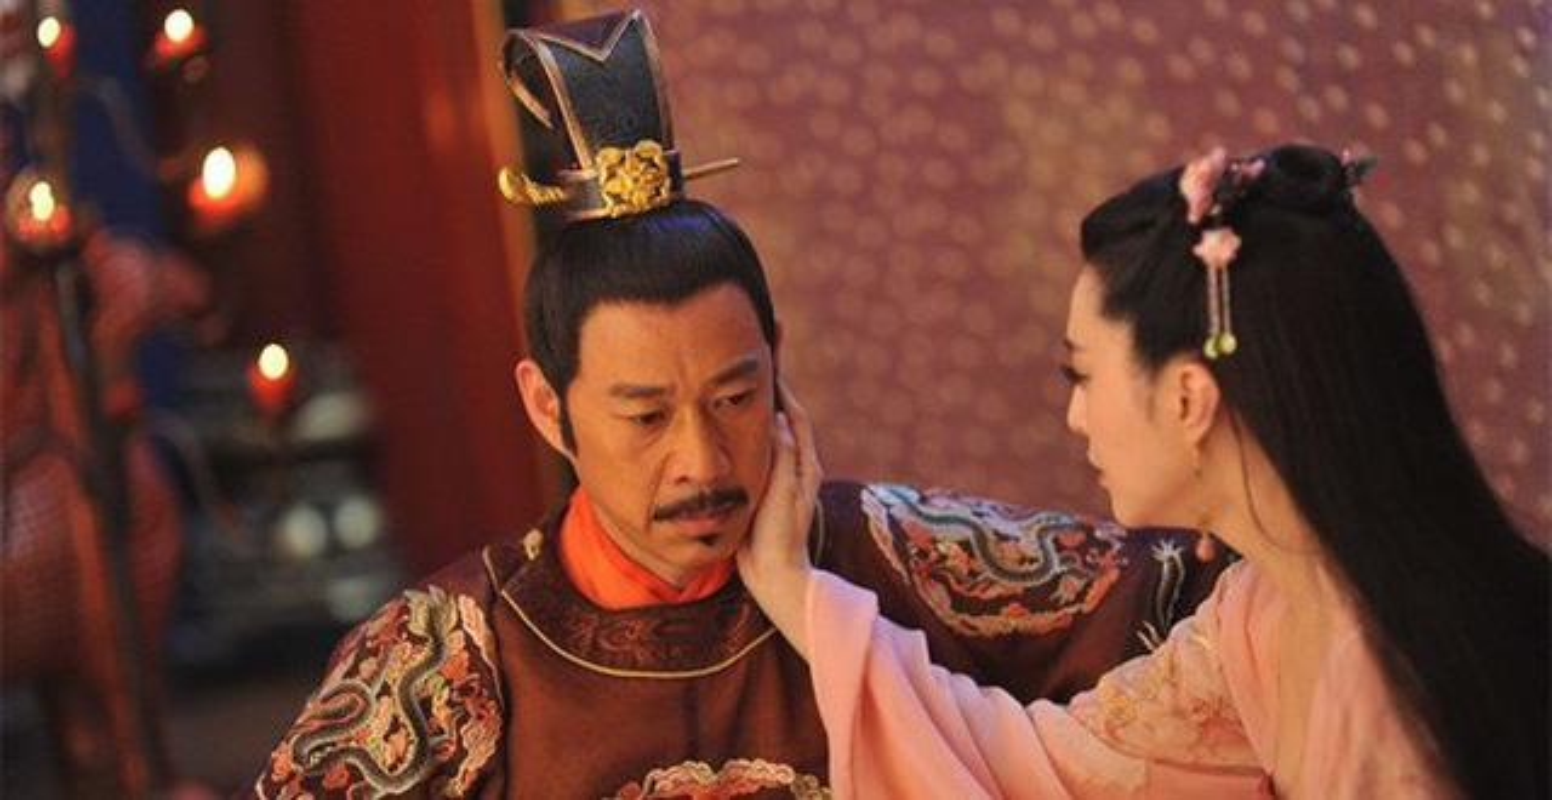 Diem ten cac chat doc chet nguoi thuong dung trong hoang cung TQ xua-Hinh-4